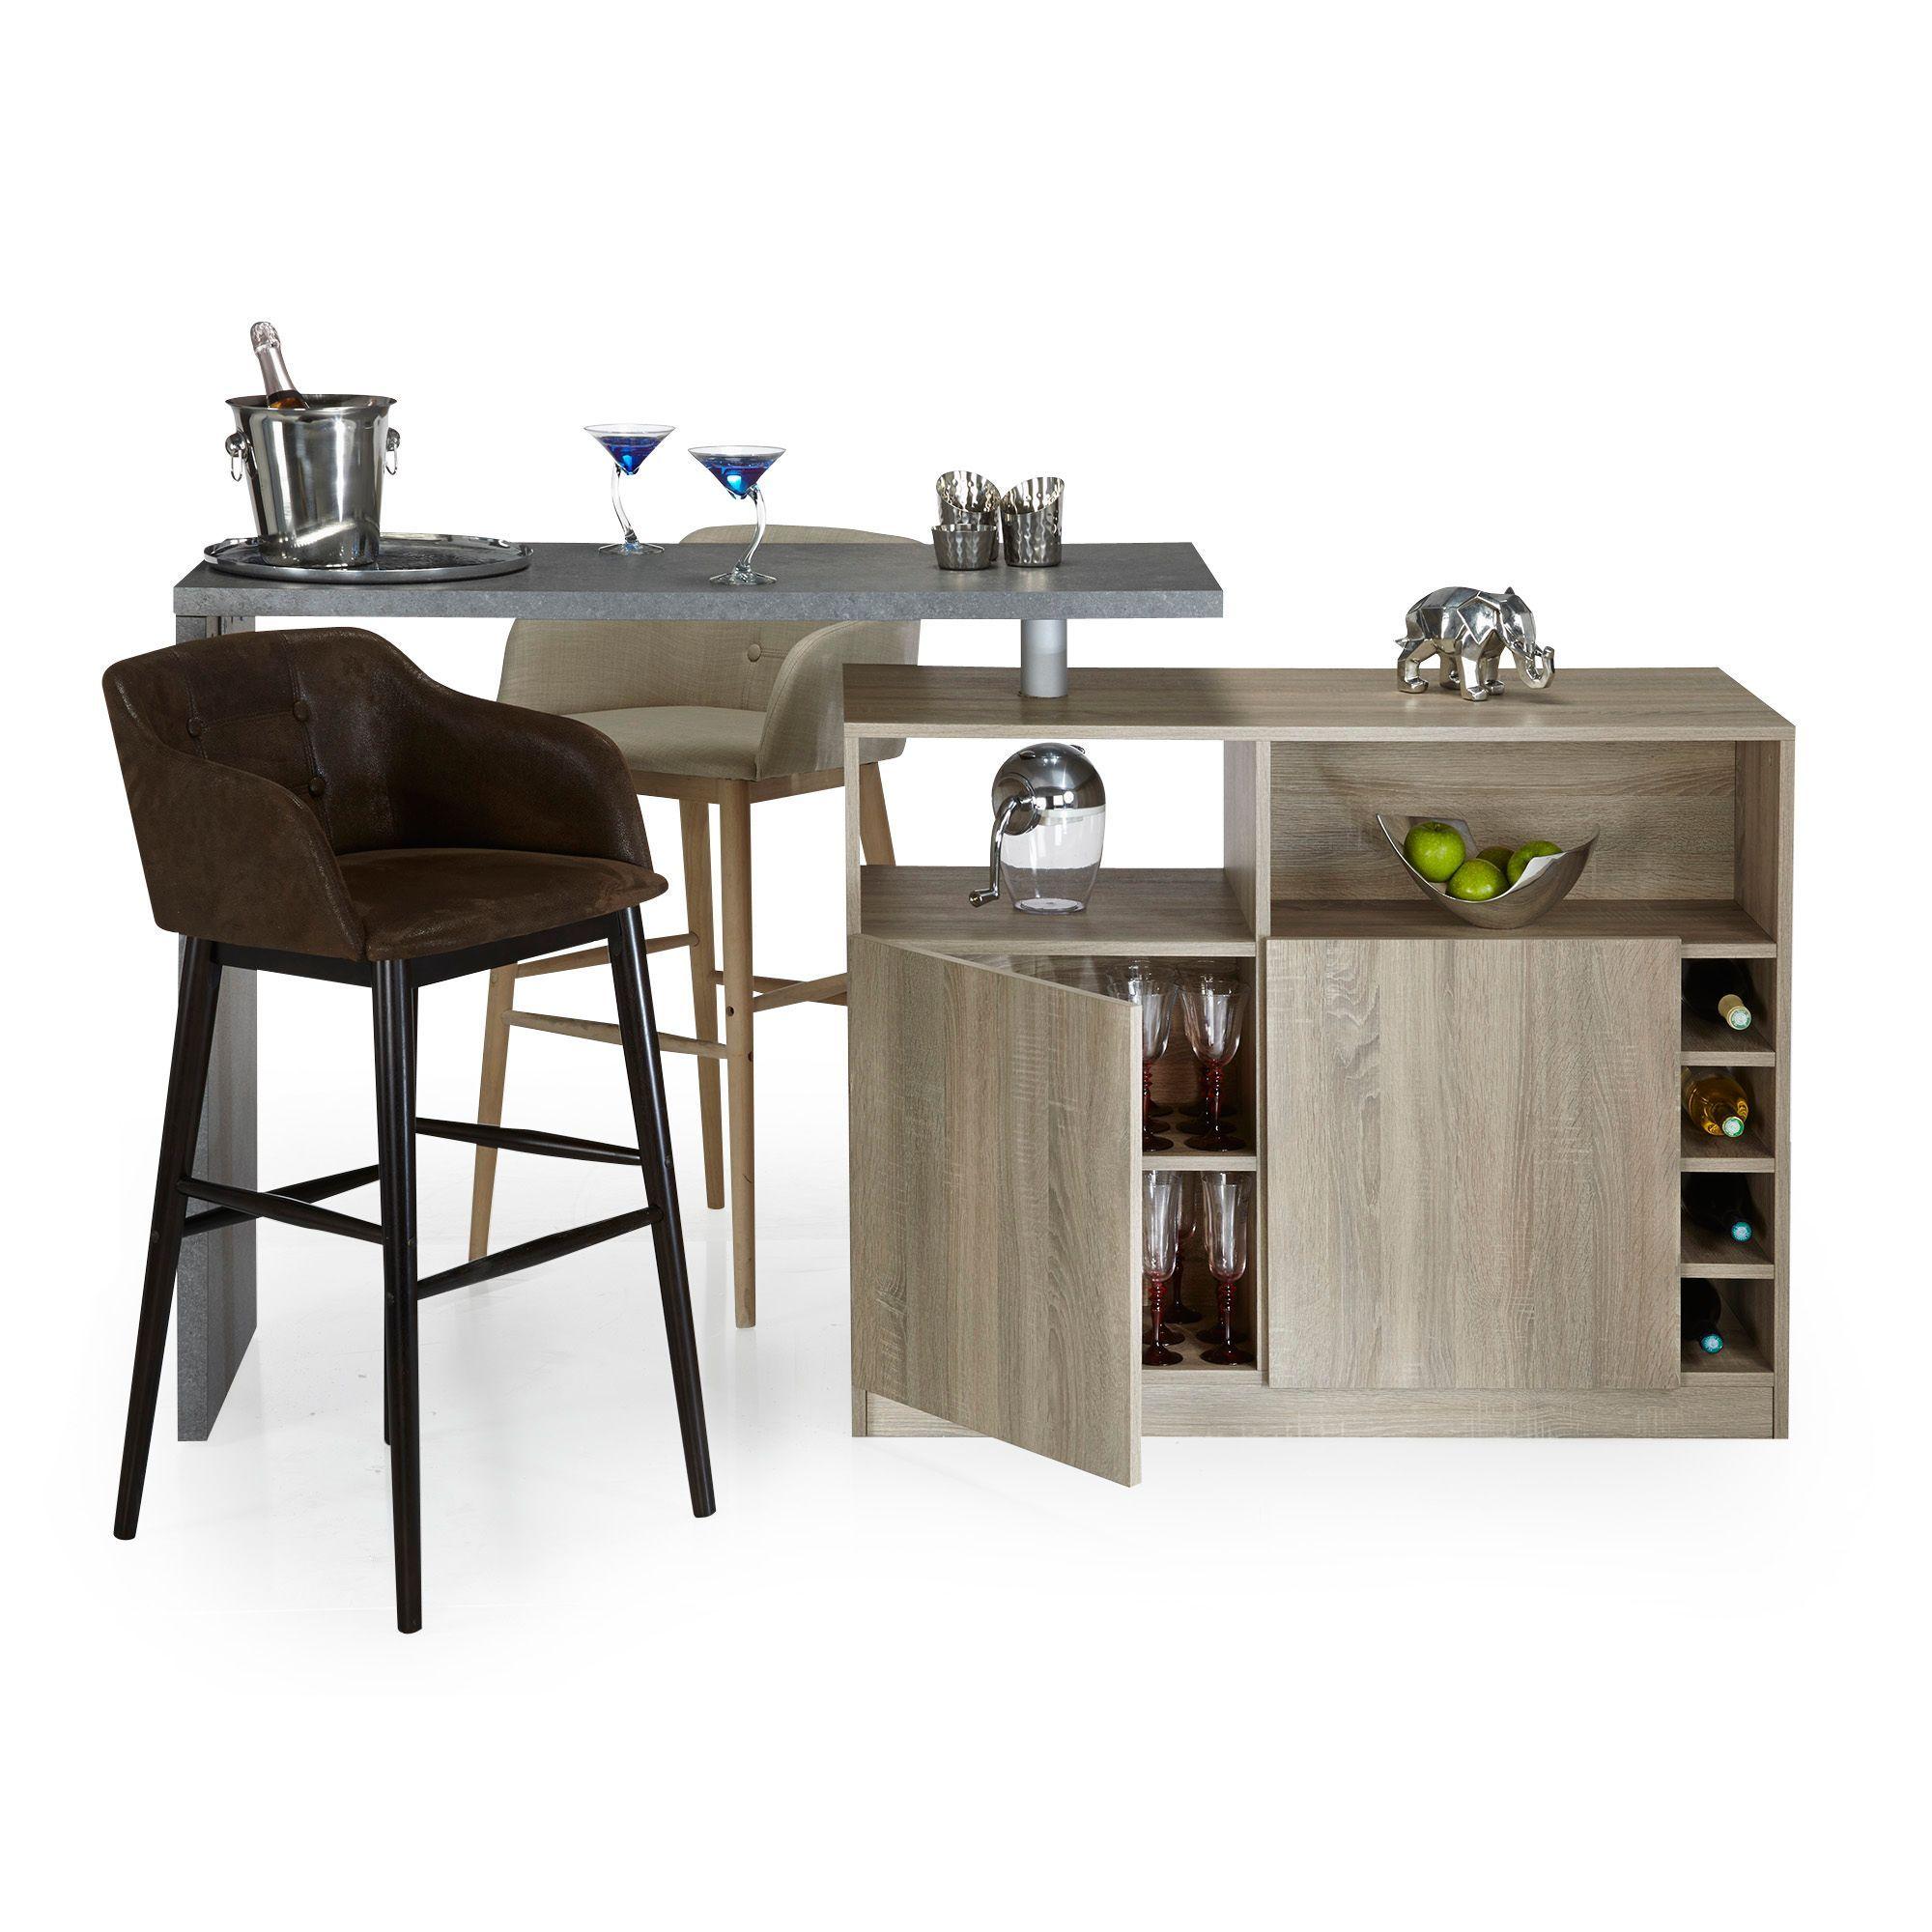 Meilleur De De Meuble Bar Salon Concept